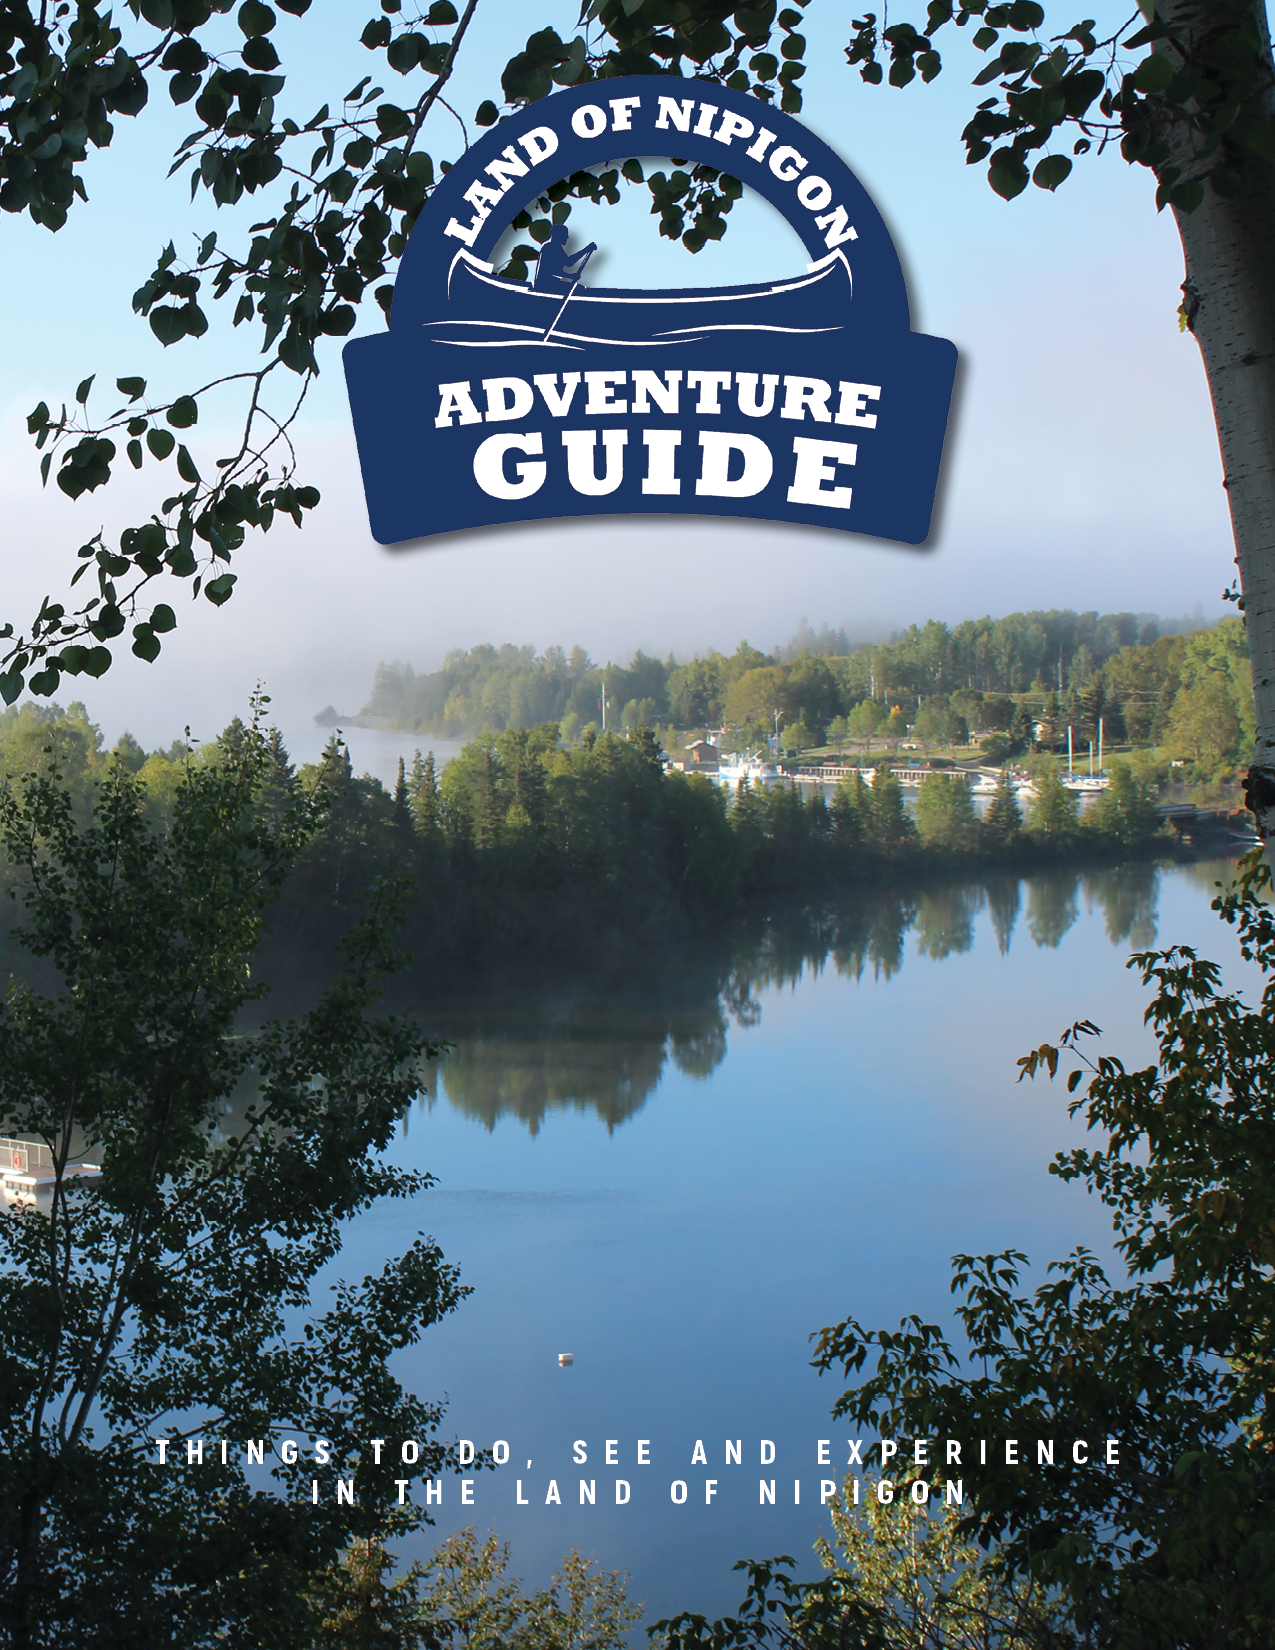 Land of Nipigon Adventure Guide Covers